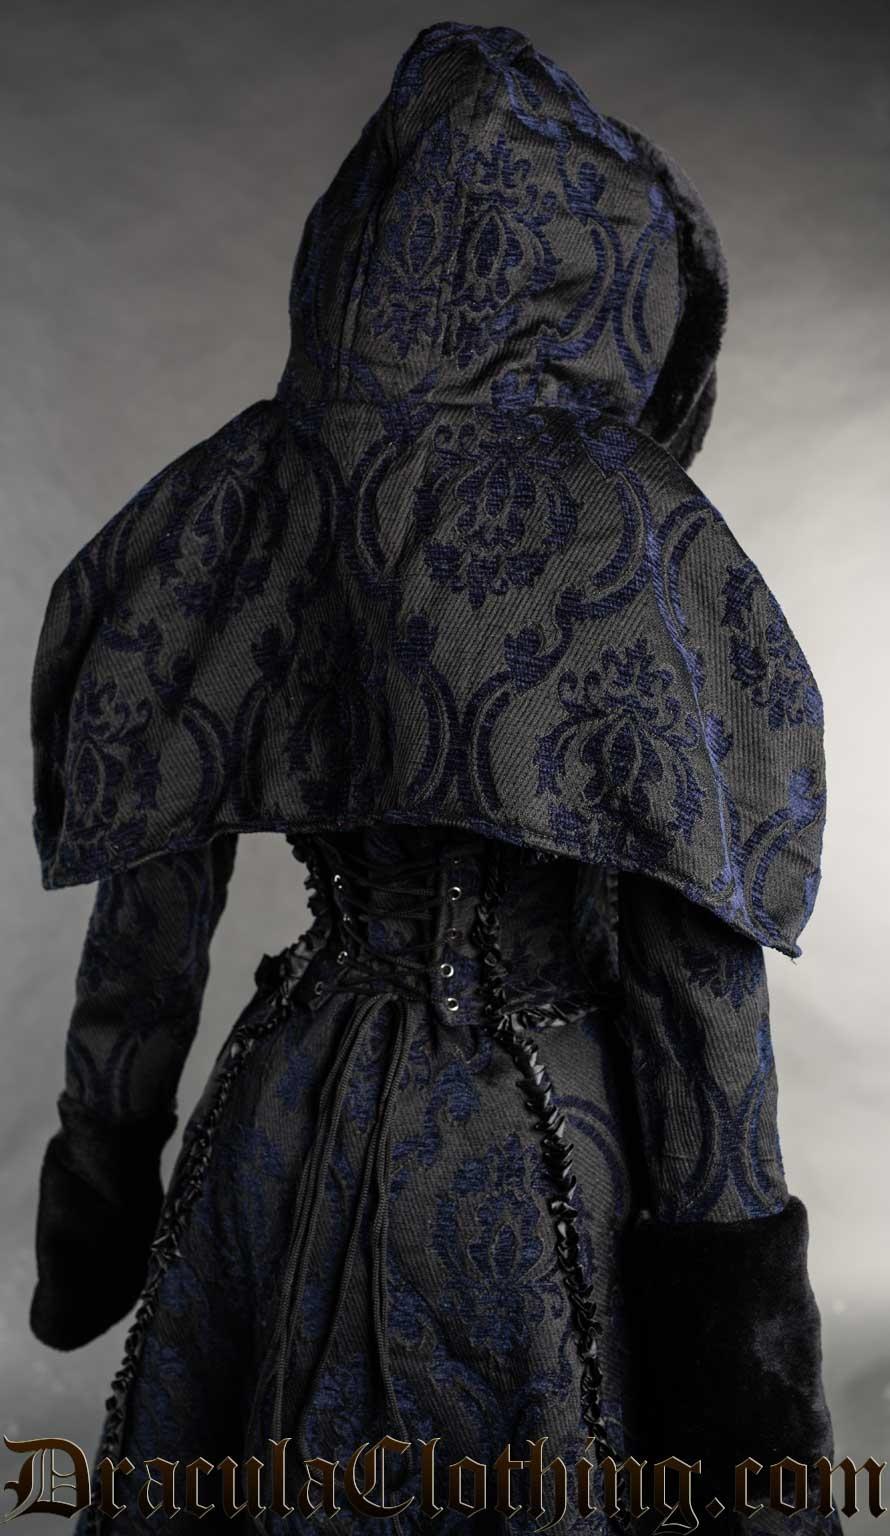 Blue Brocade Hood